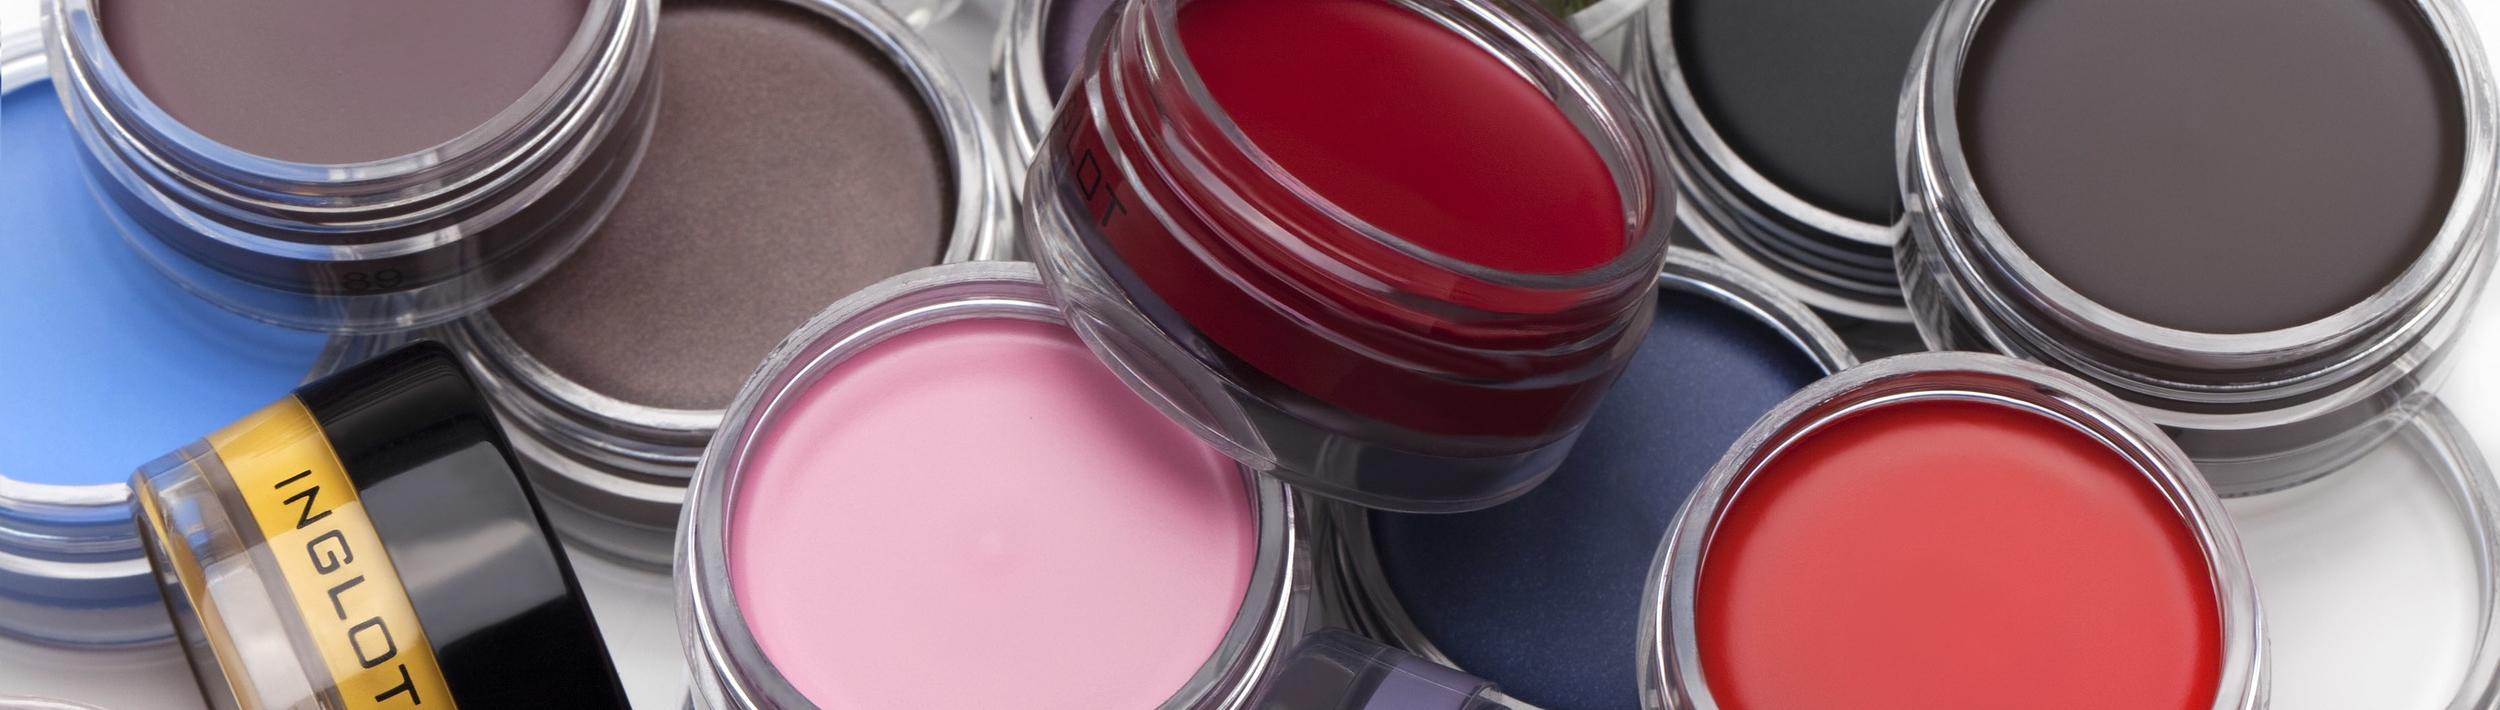 inglot-eyeliner-gel.jpg